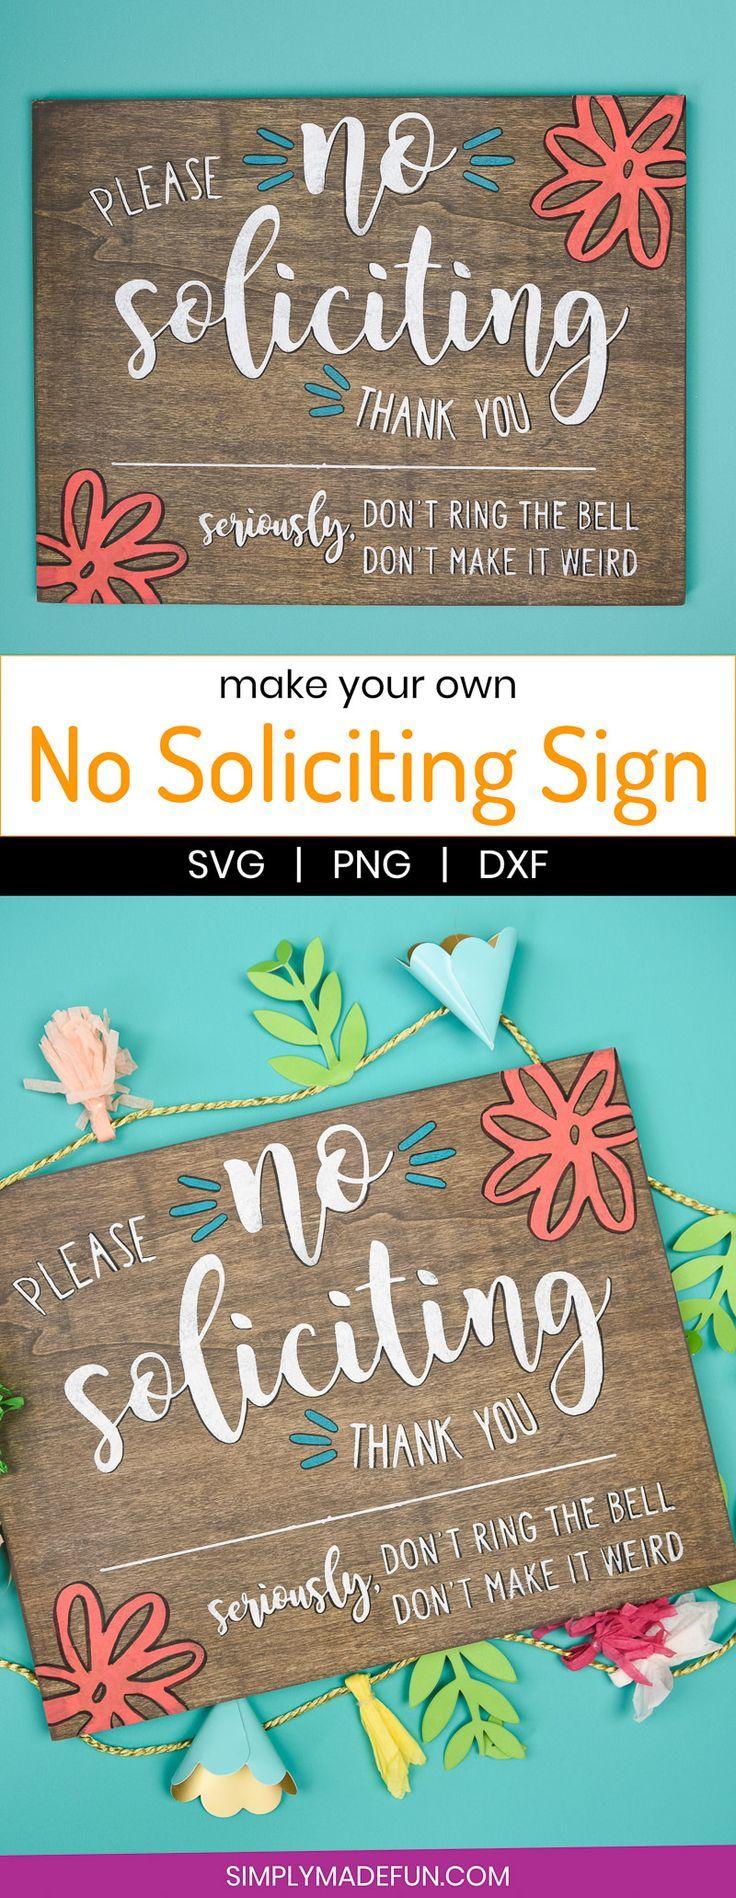 Diy No Soliciting Sign No Soliciting Signs Stencil Vinyl Things To Sell